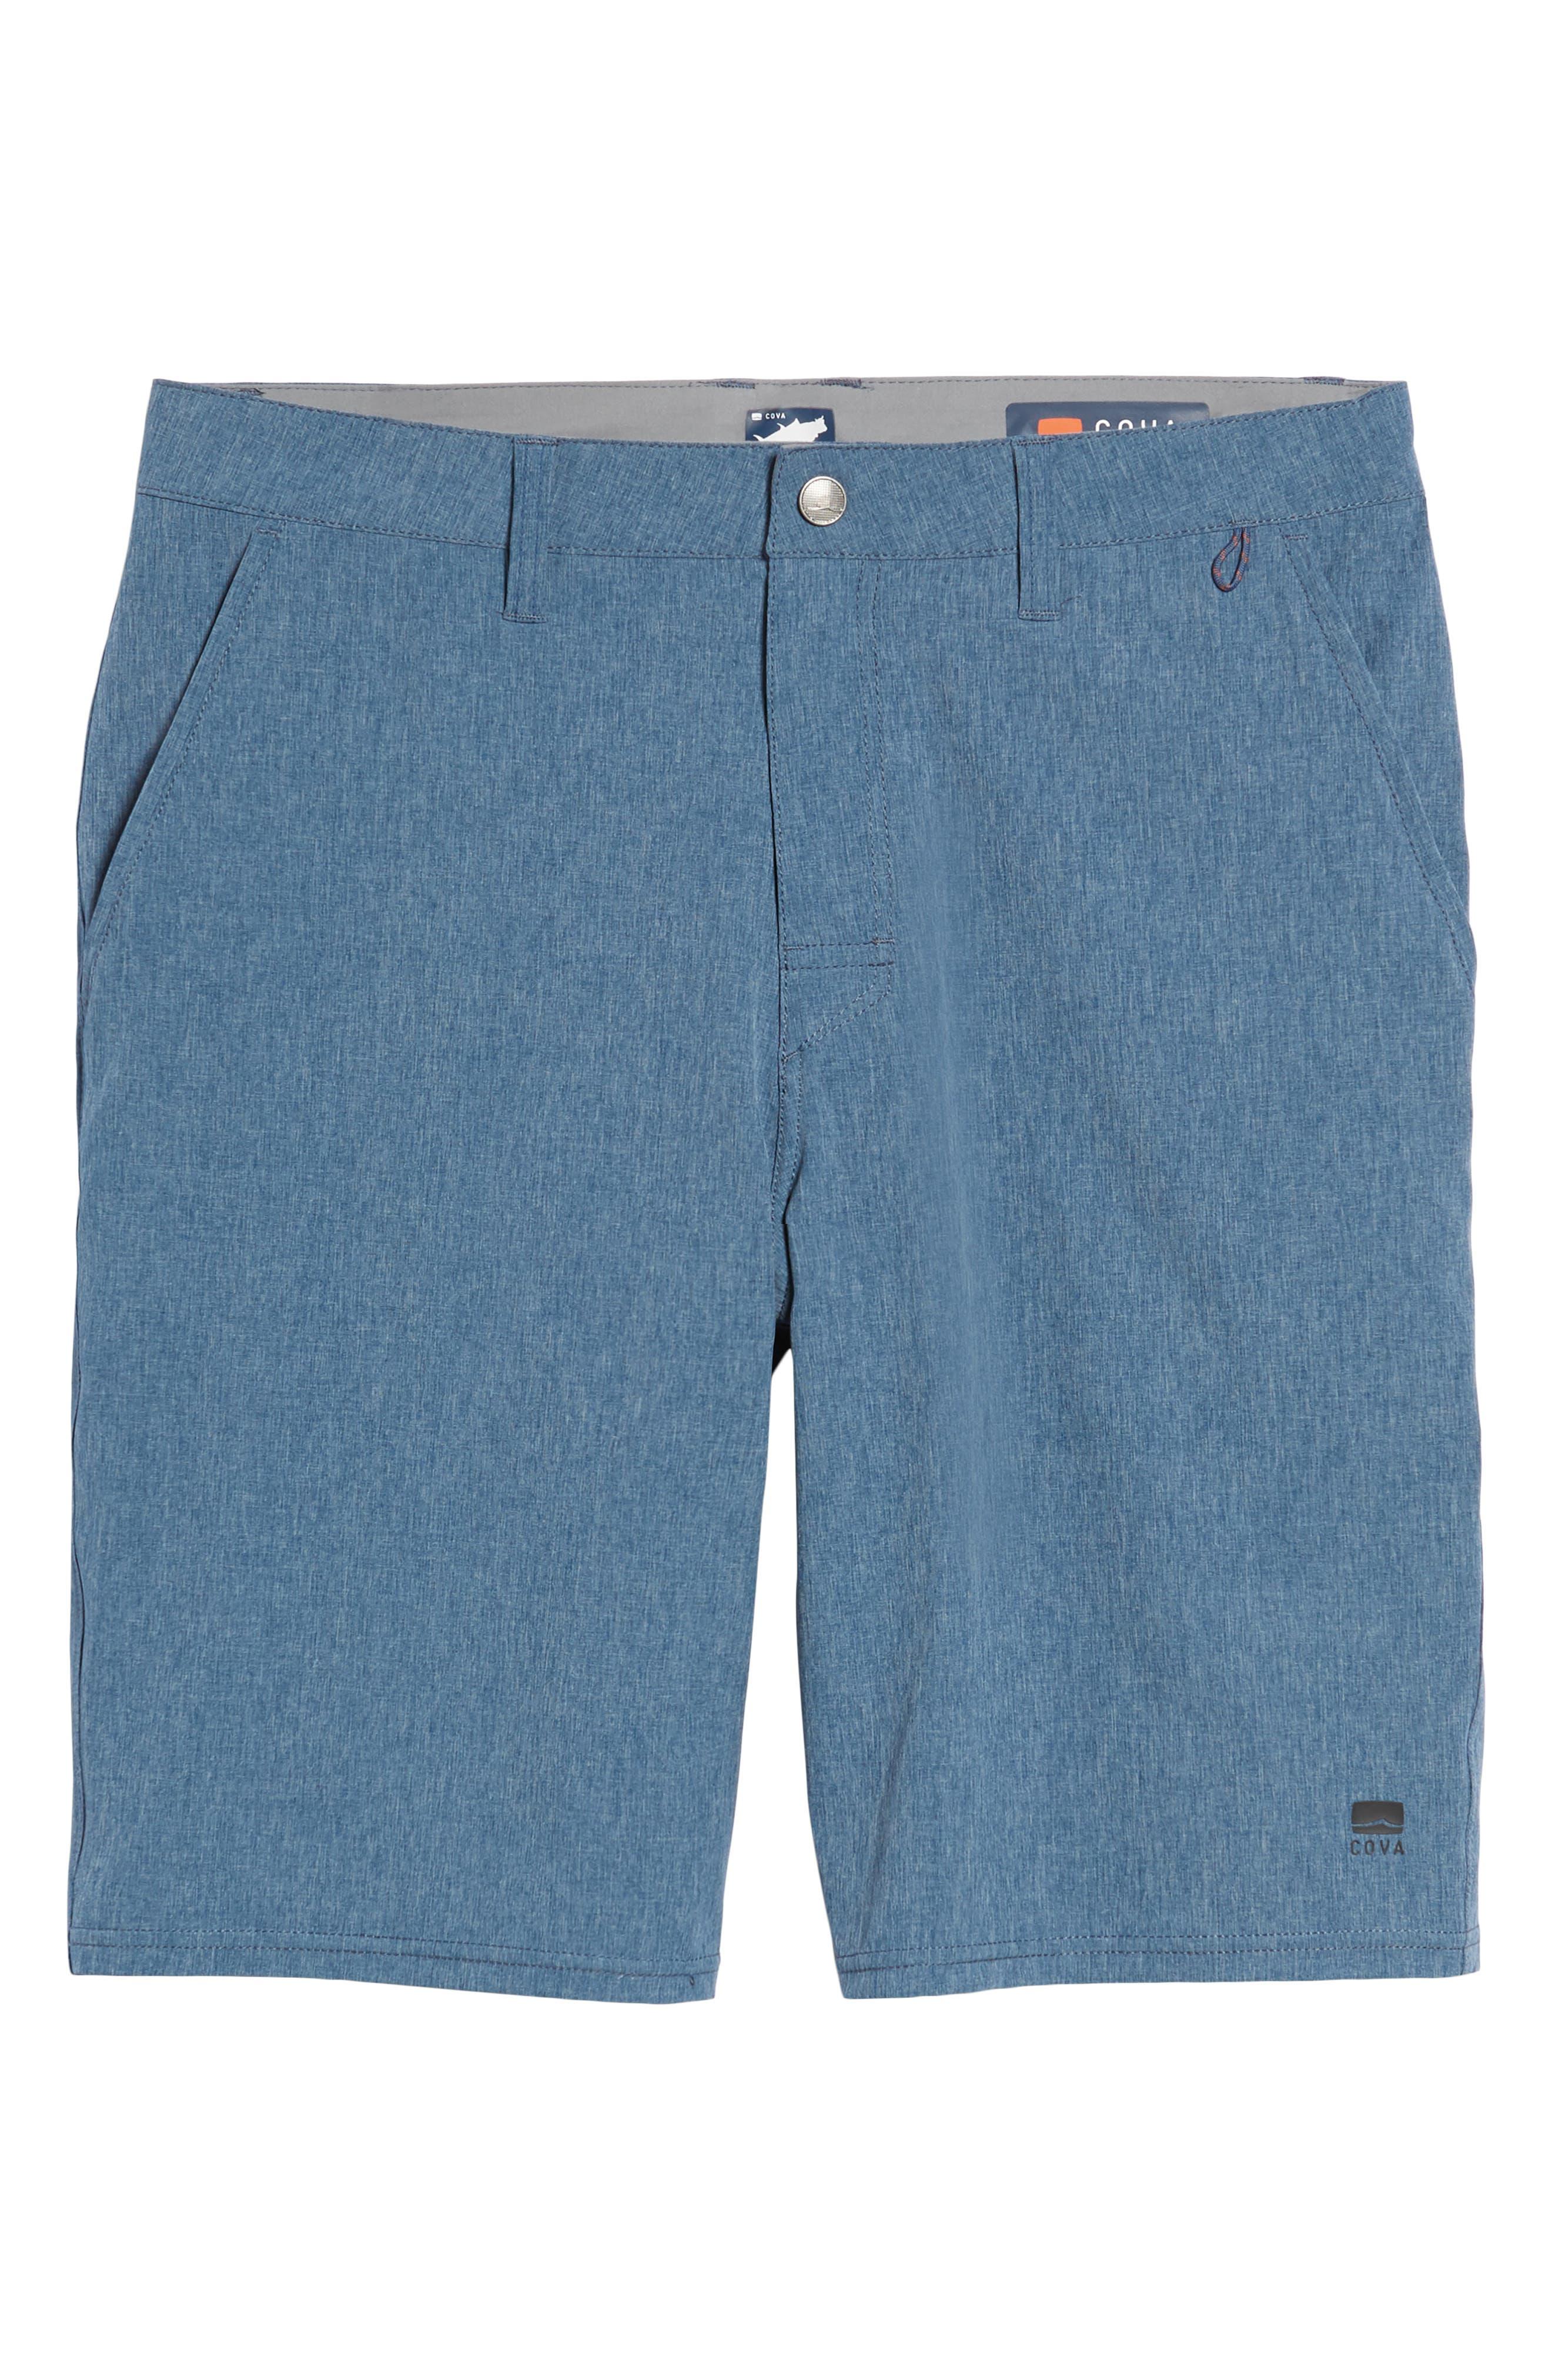 Salty Dog Hybrid Shorts,                             Alternate thumbnail 6, color,                             DEEP SEA